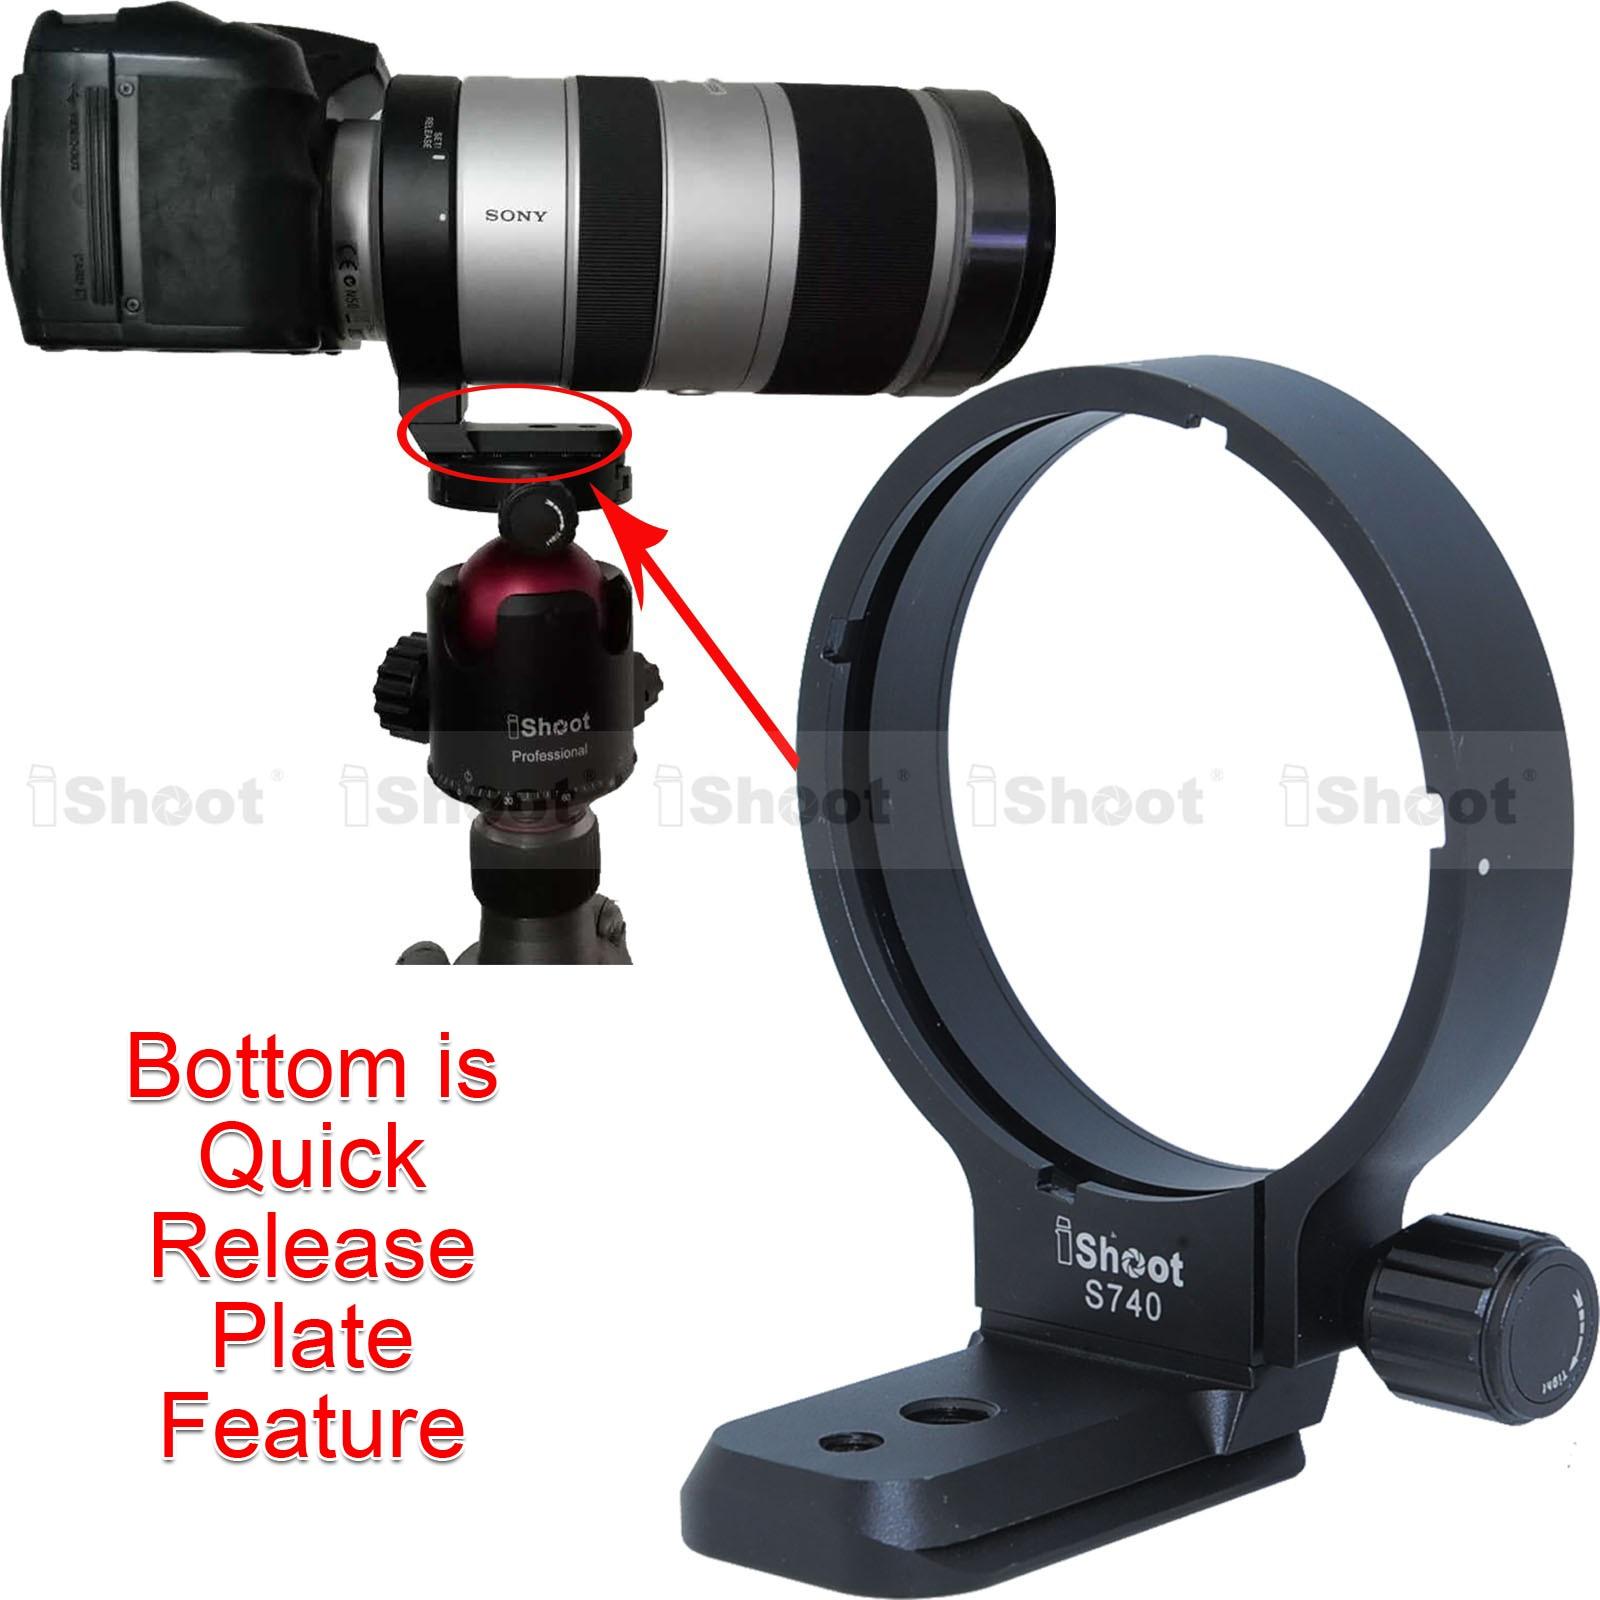 Lens Support Collar Tripod Mount Ring for Sony 70-400mm F4-5.6 G SSM (SAL70400G) and 70-400mm F4-5.6 G SSM II (SAL70400G2) объектив sony sal 2470z2 24 70 mm f 2 8 za ssm ii